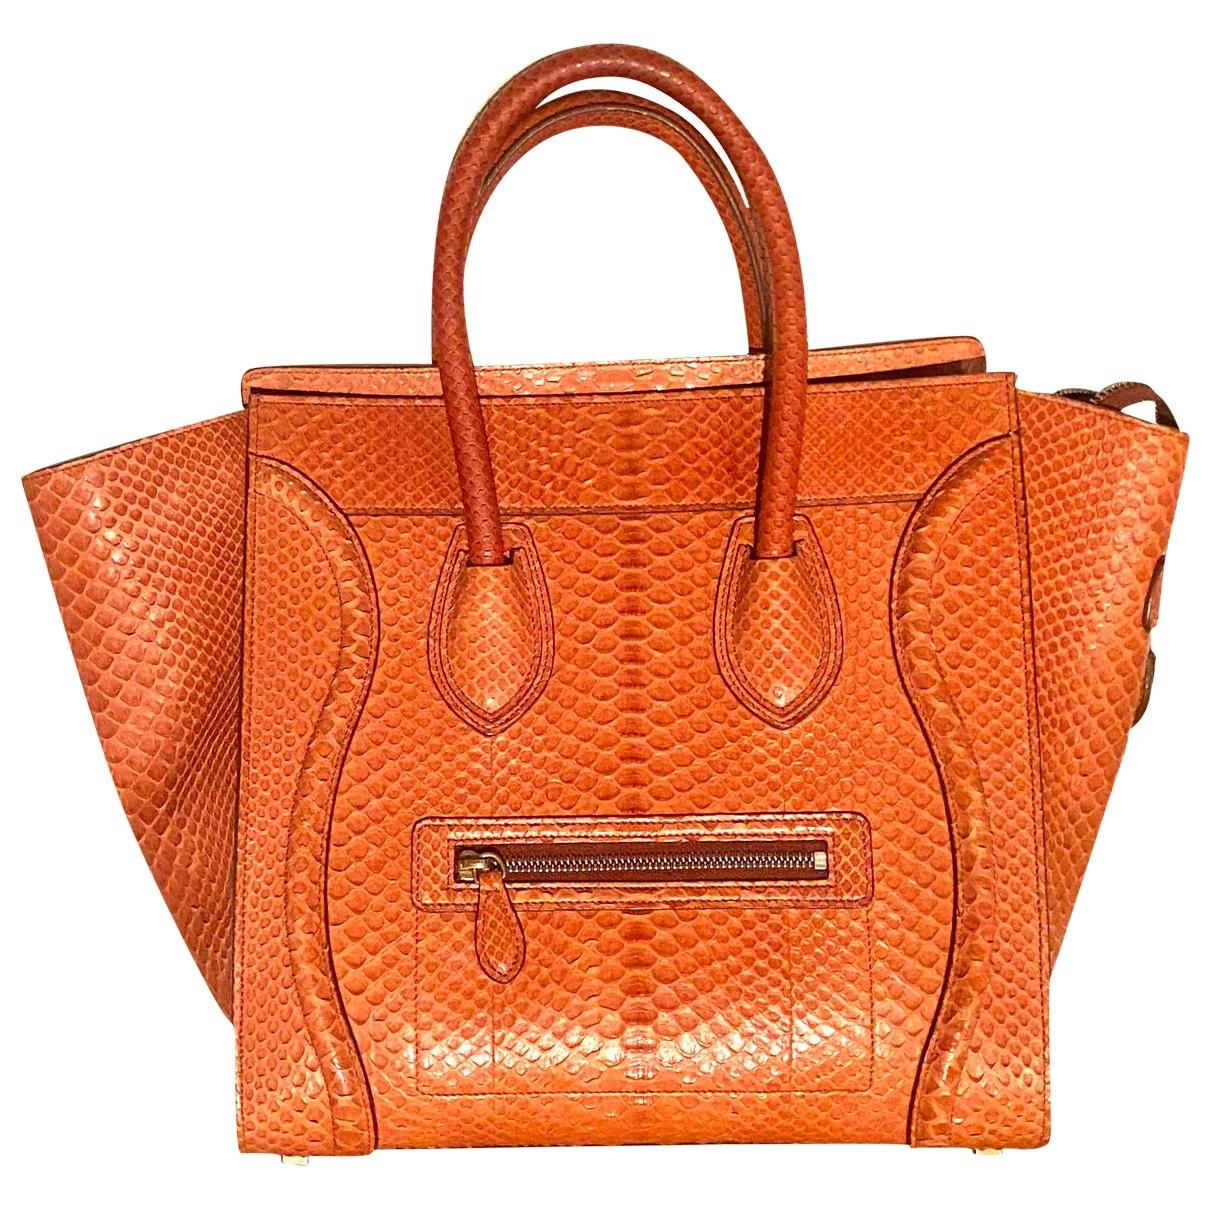 Celine Luggage Orange Python handbag for Women \N